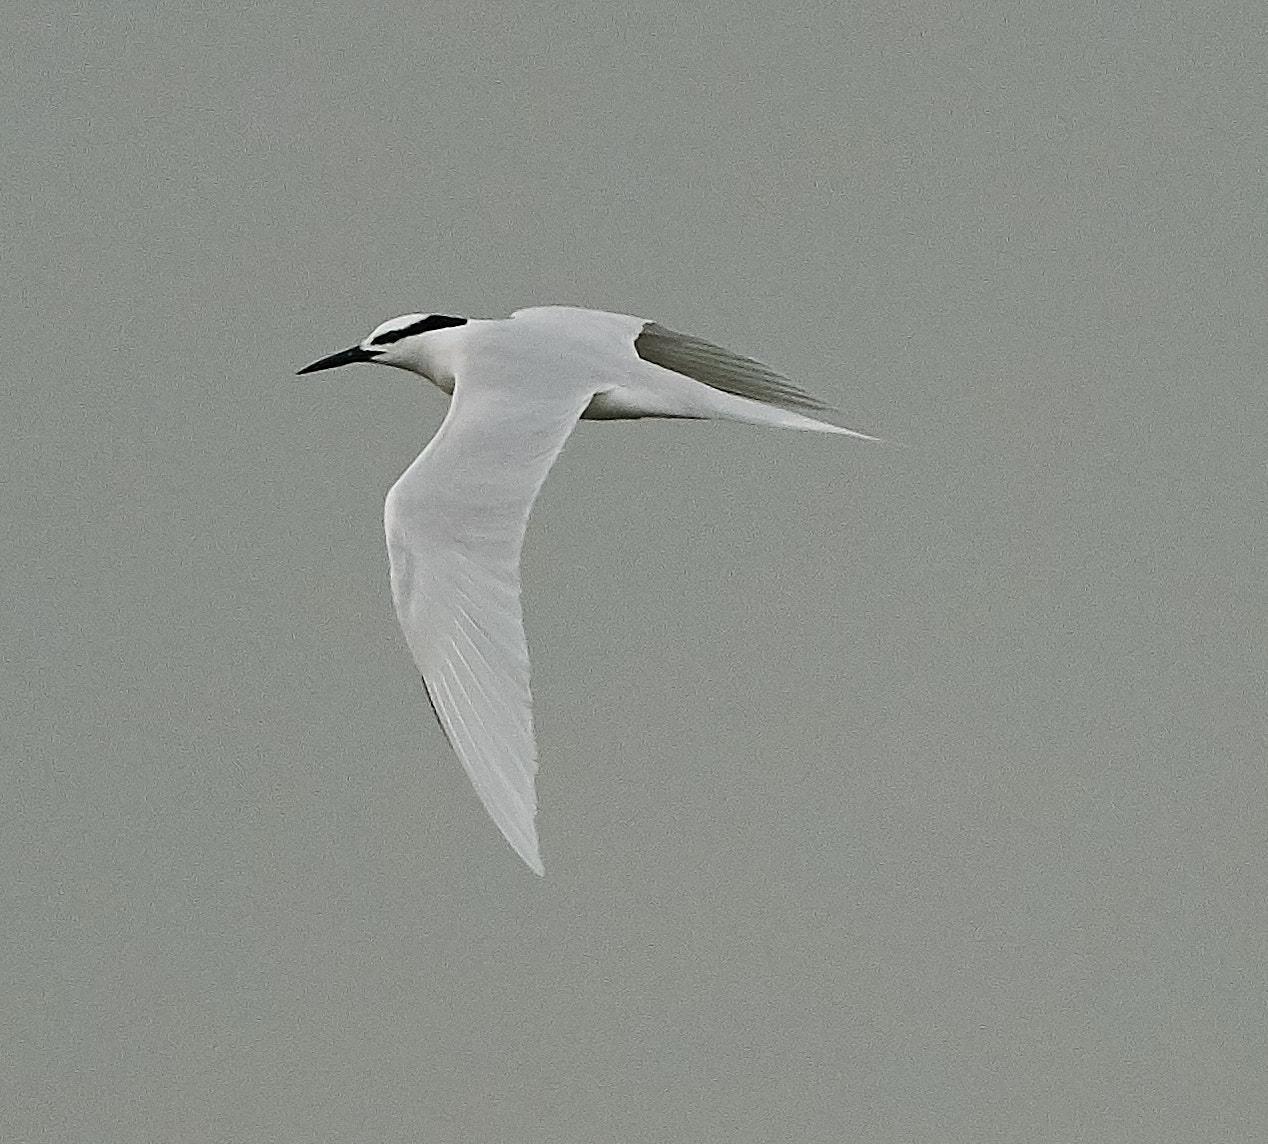 Black-naped Tern Photo by Steven Cheong